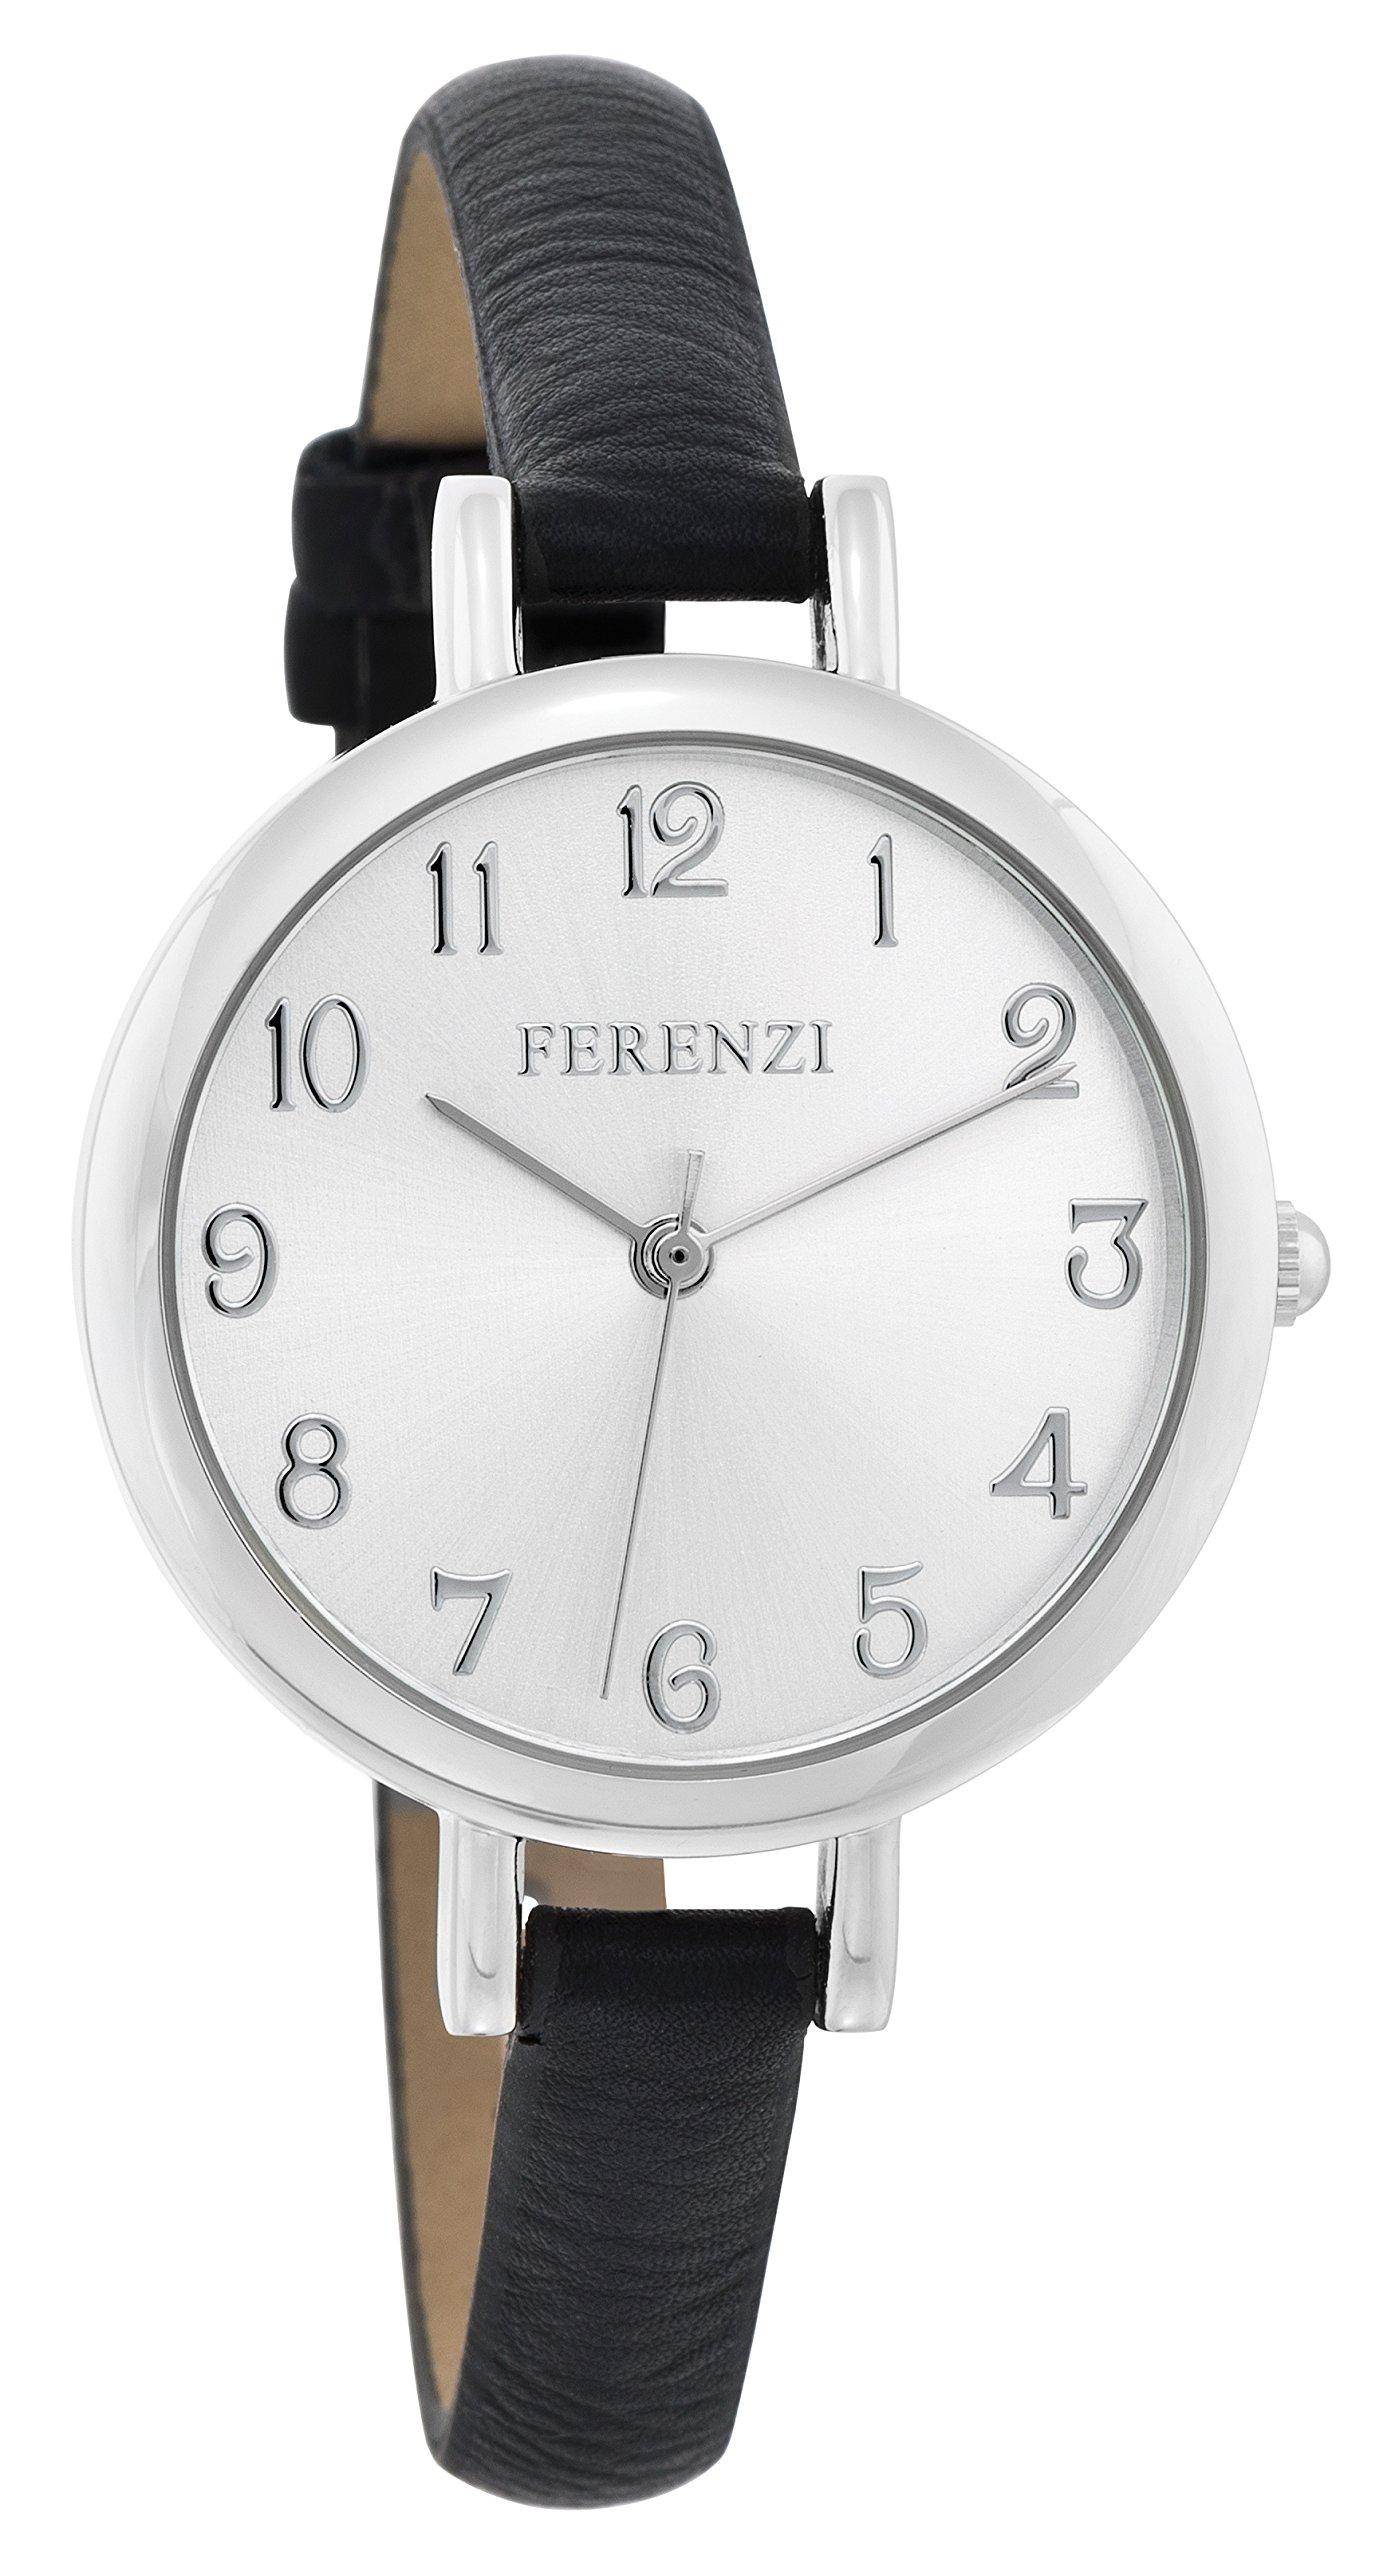 Women's Watches by FERENZI | Elegant Silver-Tone Black PU Leather Thin Band Watch | FZ15502